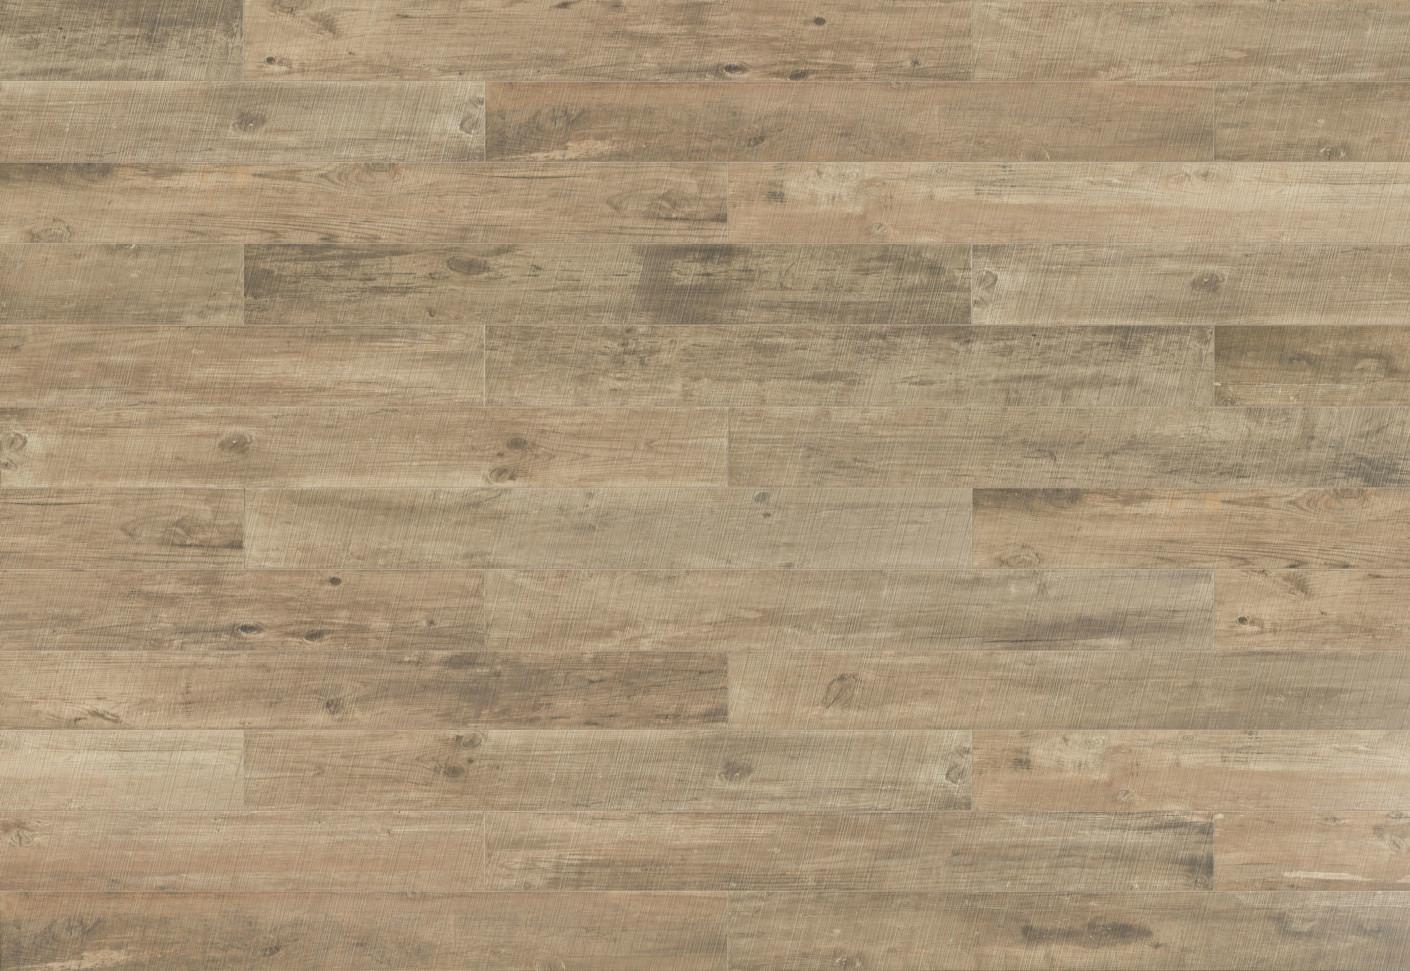 Styletech light wood by floor gres stylepark - Gres imitacion parquet ...